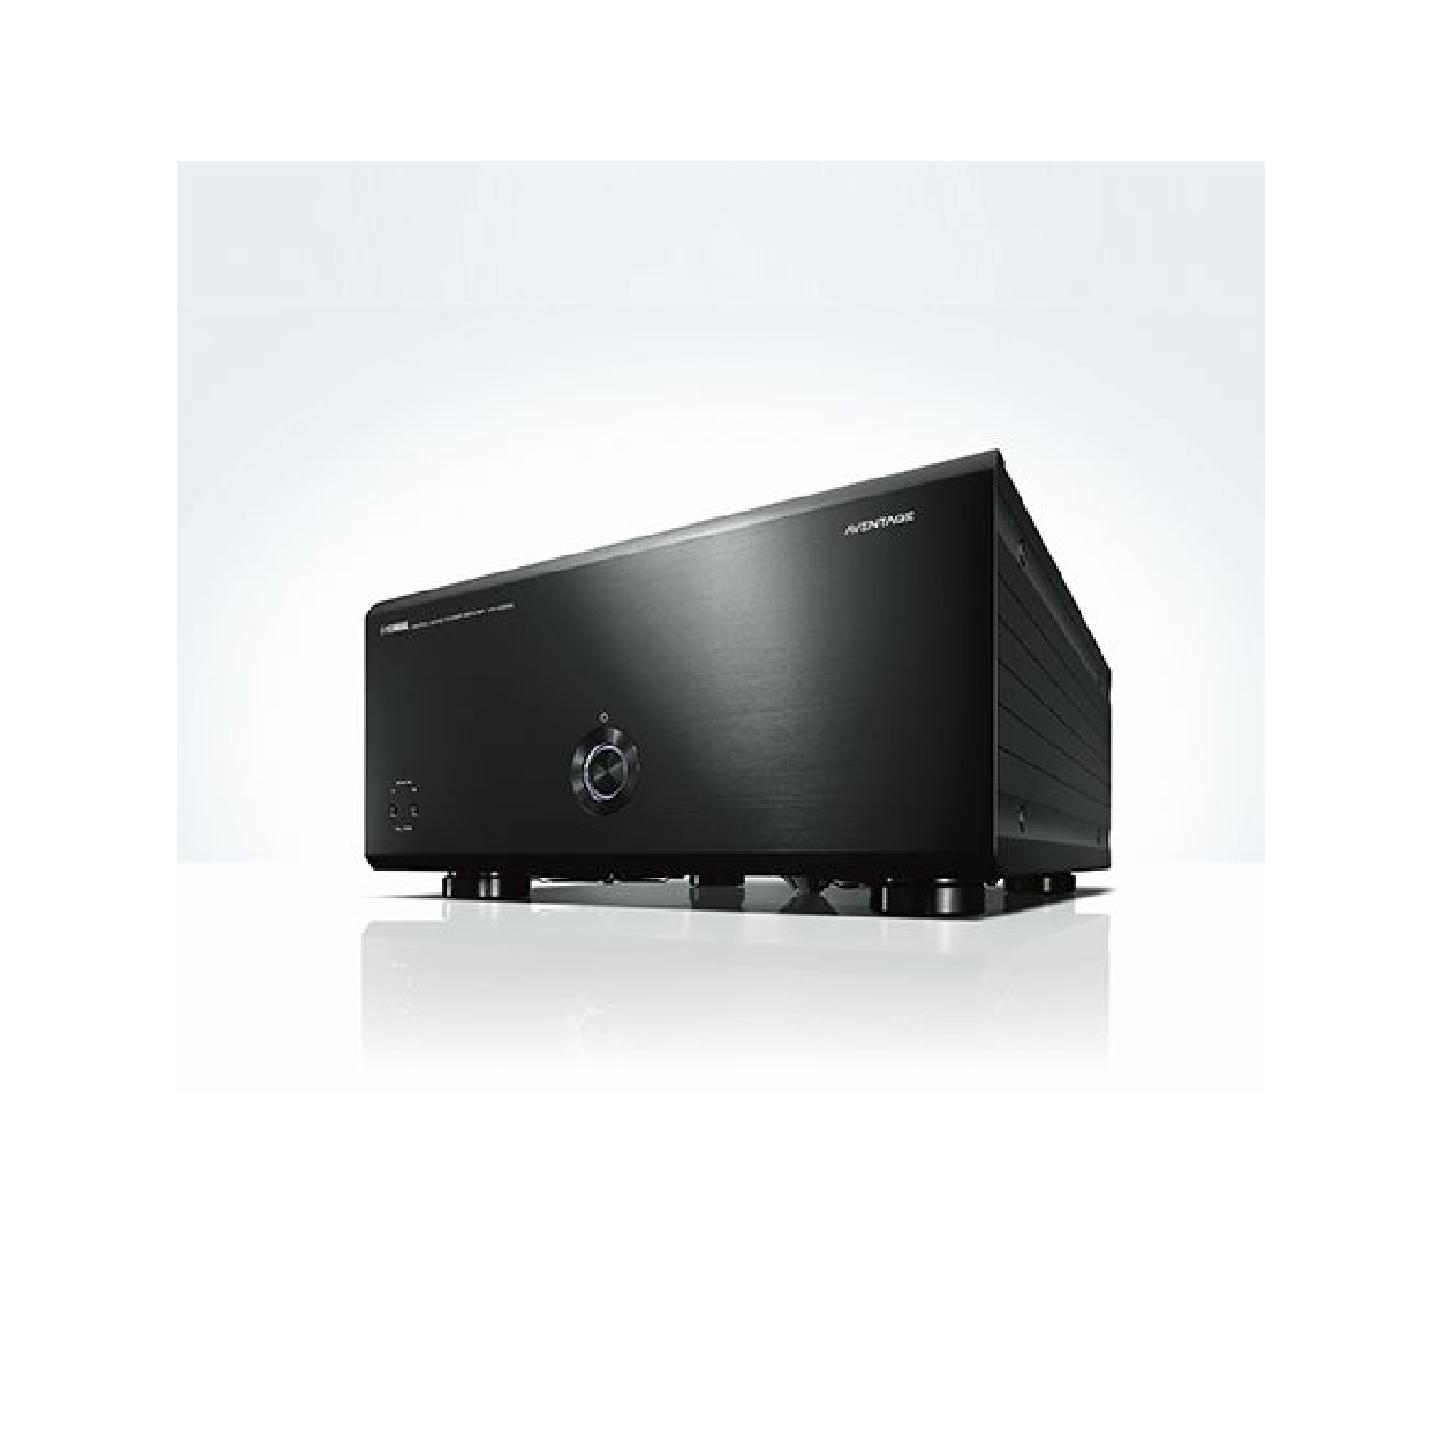 Yamaha AVENTAGE AV Receiver MX-A5000